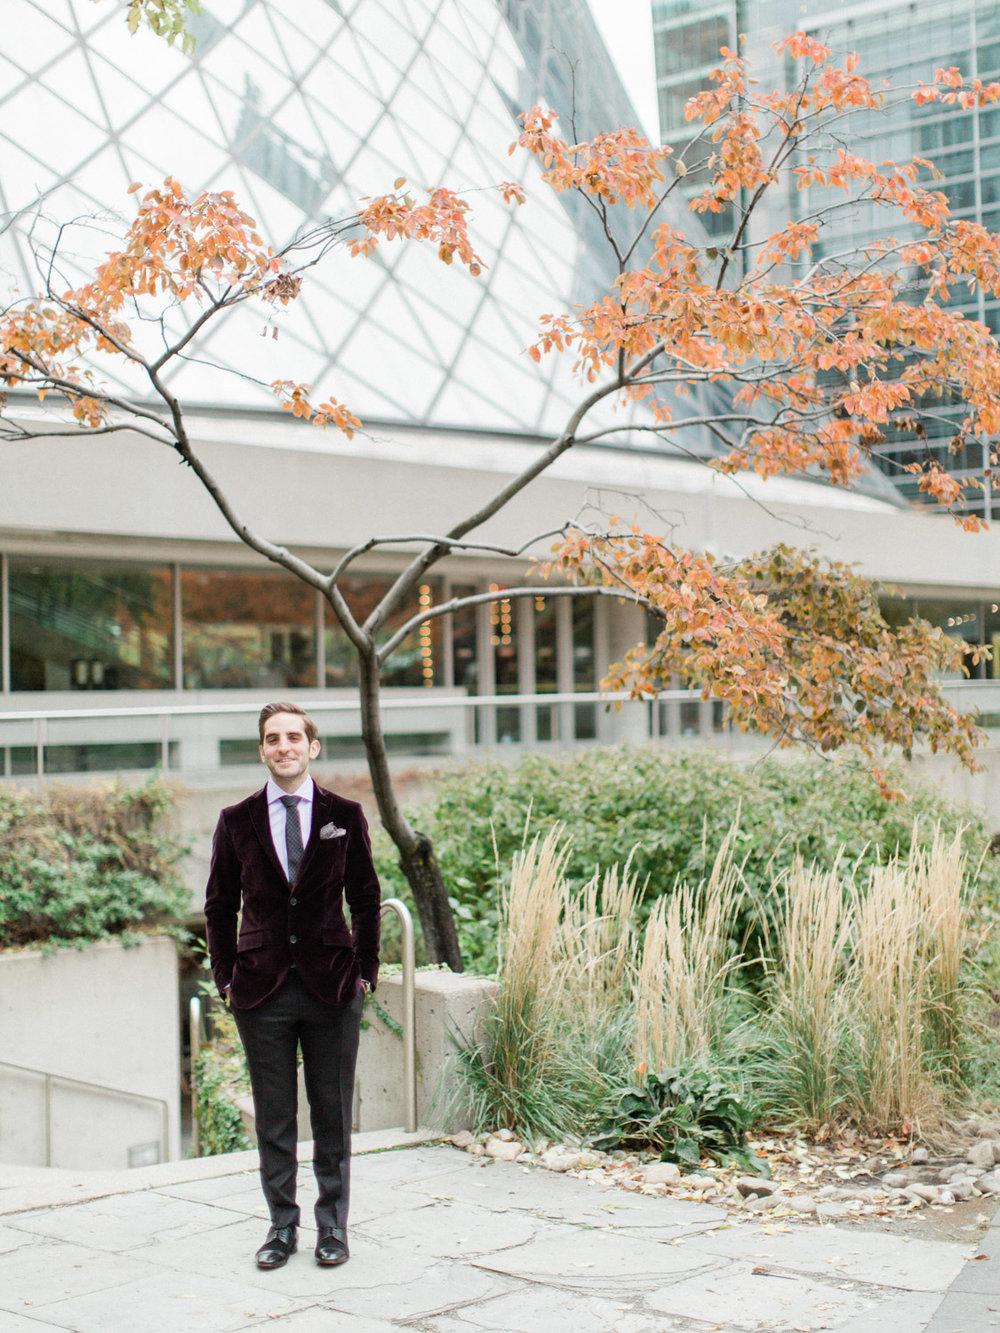 Toronto-wedding-photographer-intimate-italian-the-burroughes-downtown25.jpg